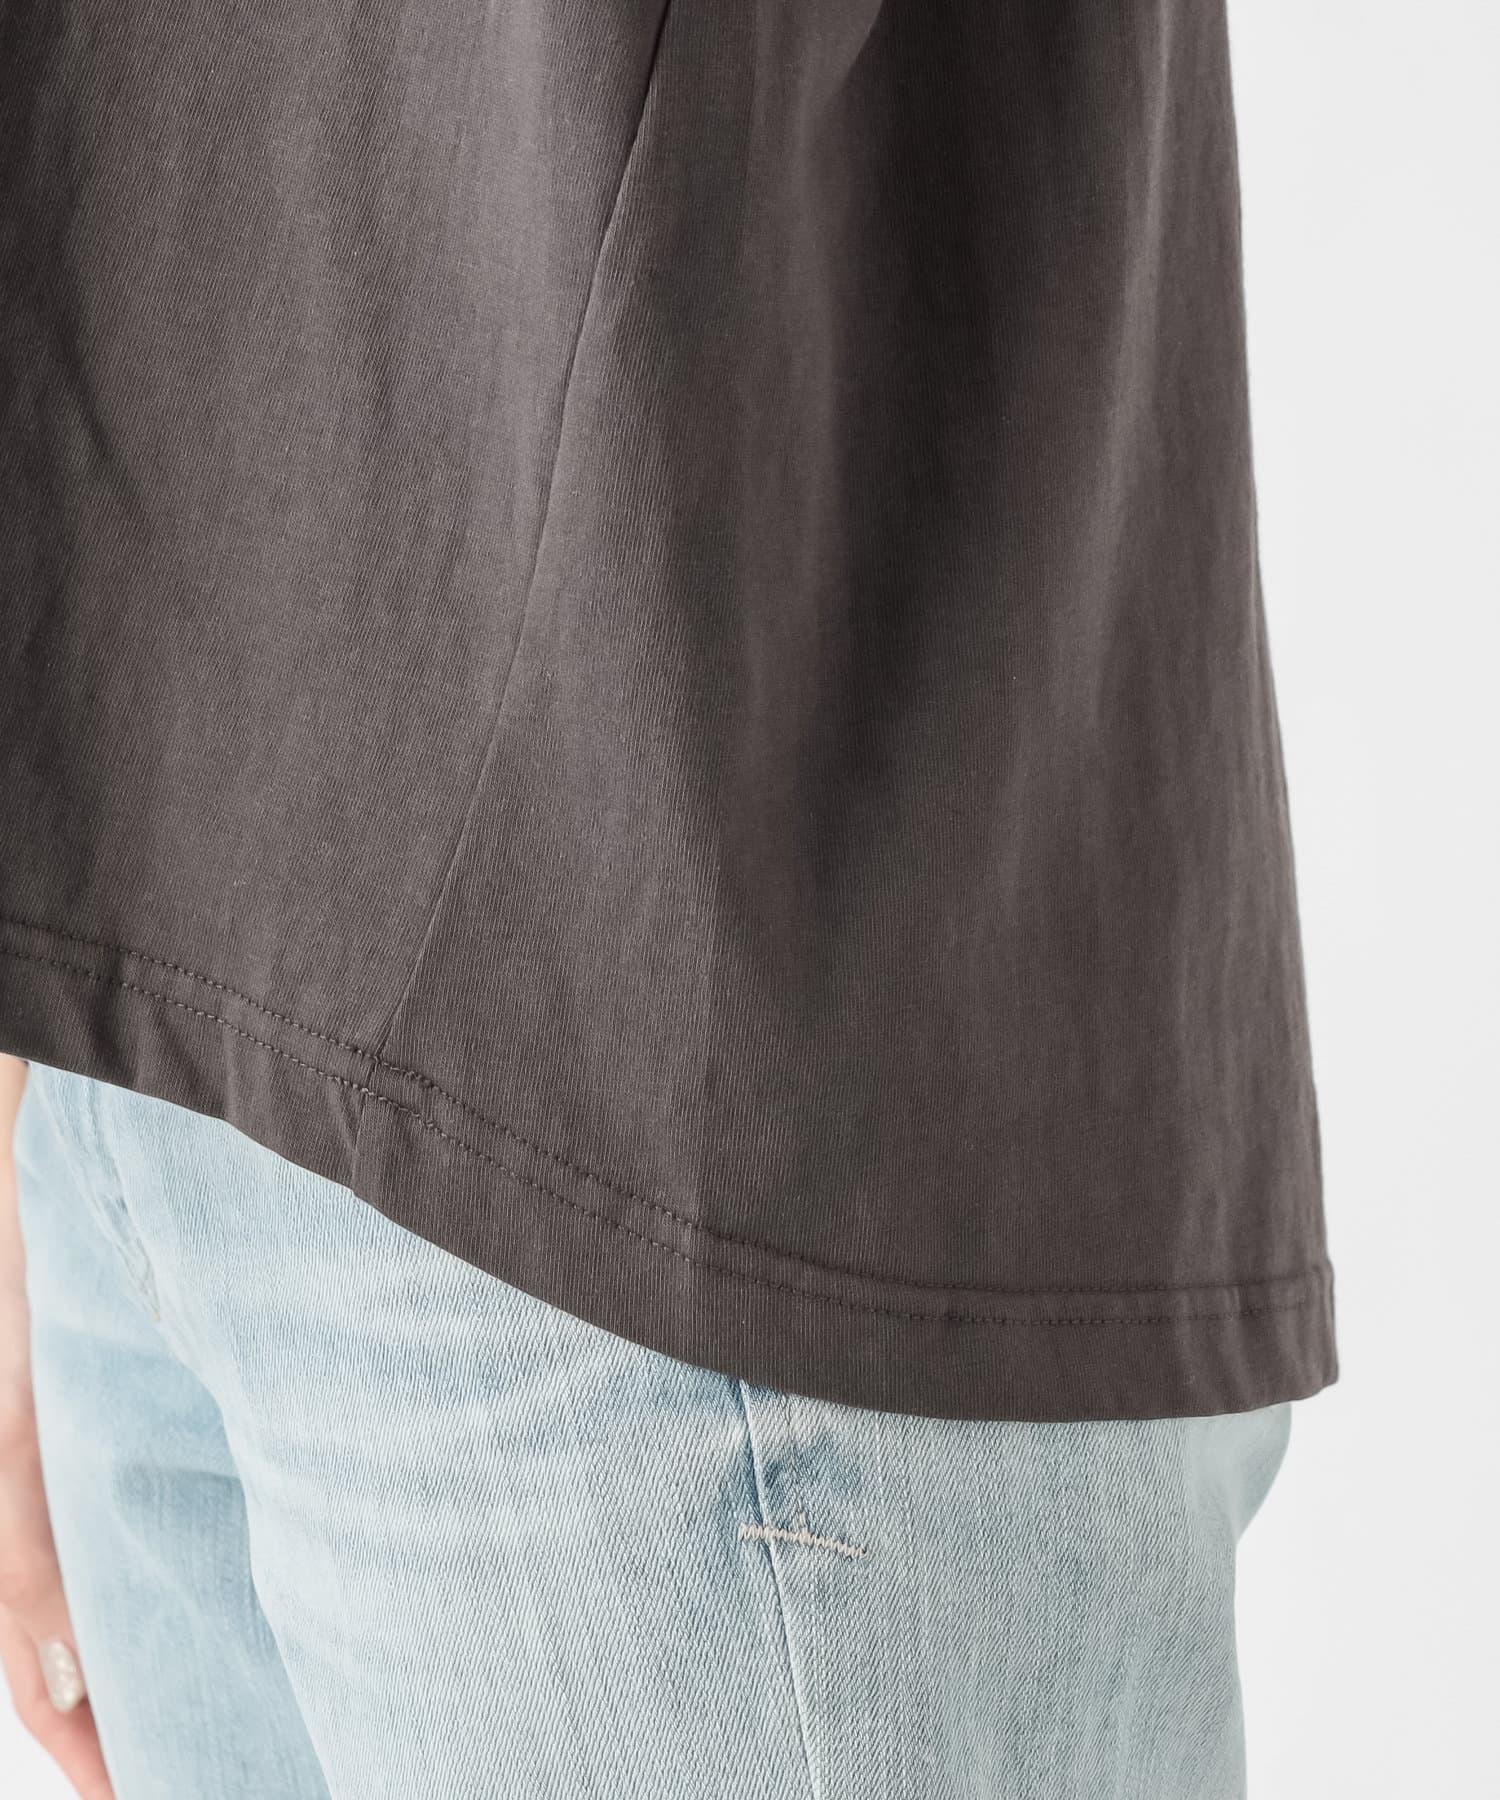 RIVE DROITE(リヴドロワ) 【《WEB限定》手洗い可】LYON半袖Tシャツ